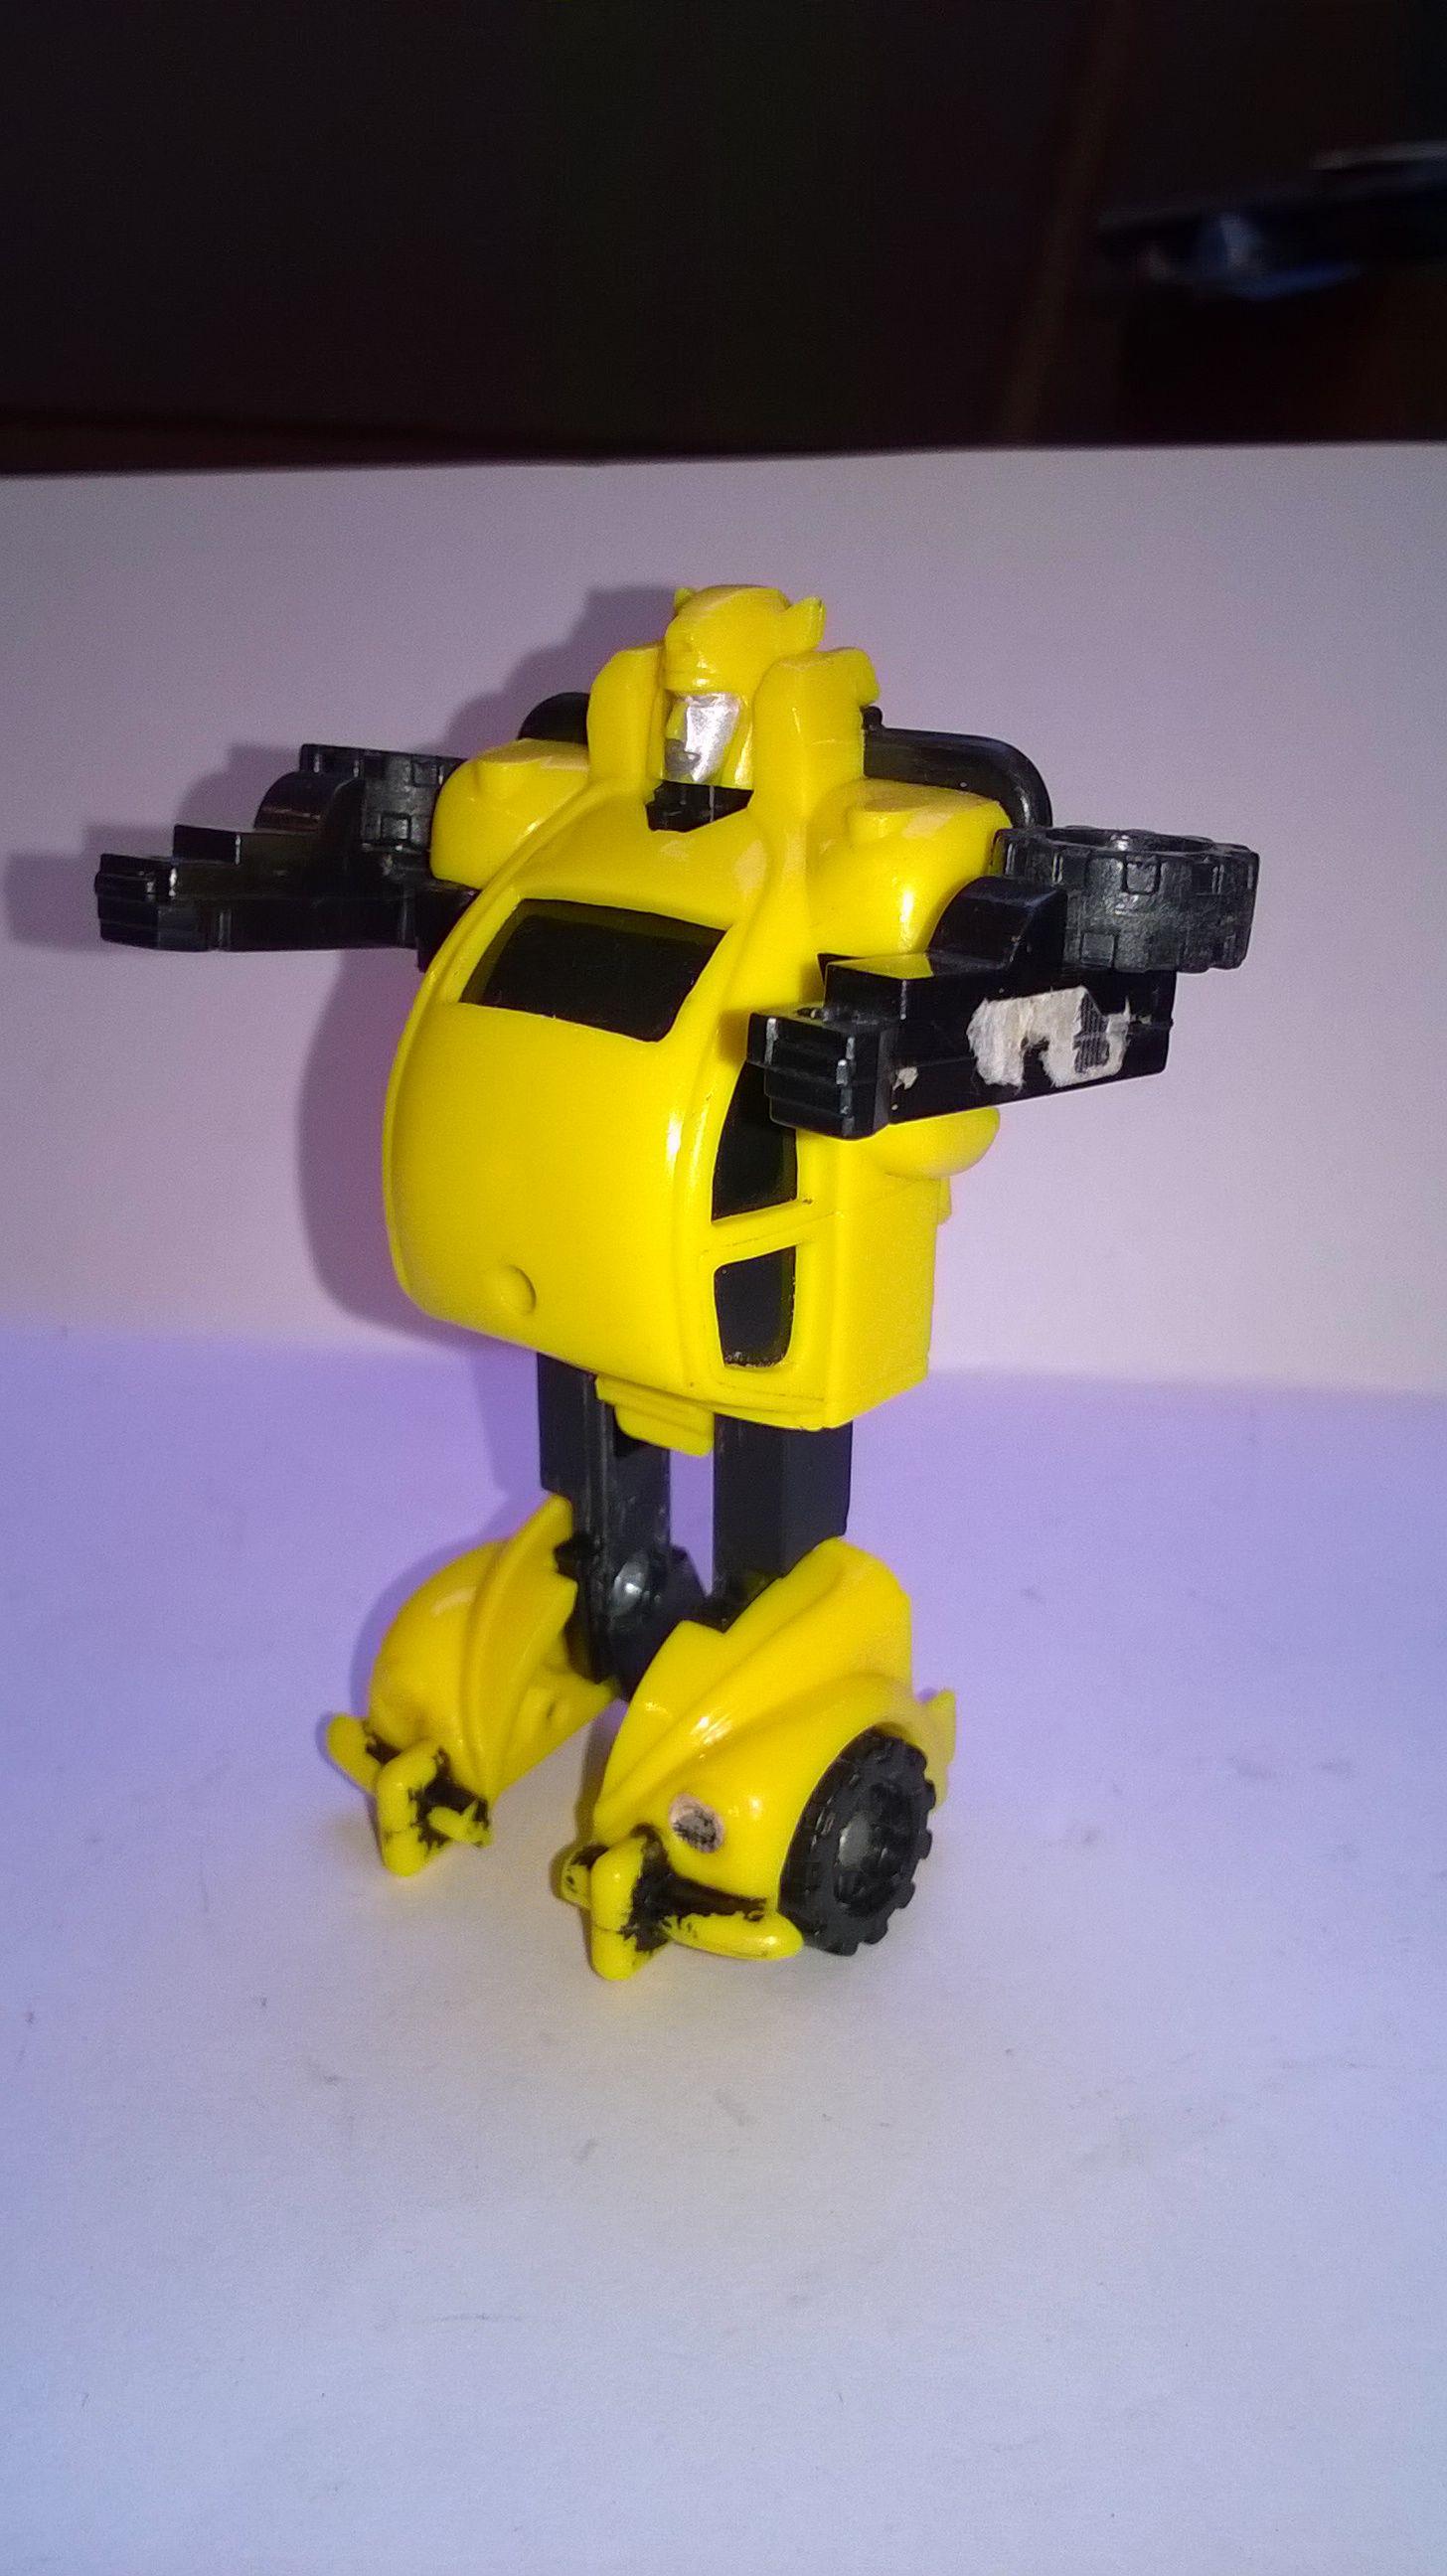 HASBRO.inc takara1989 volkswagen transformer made in macau